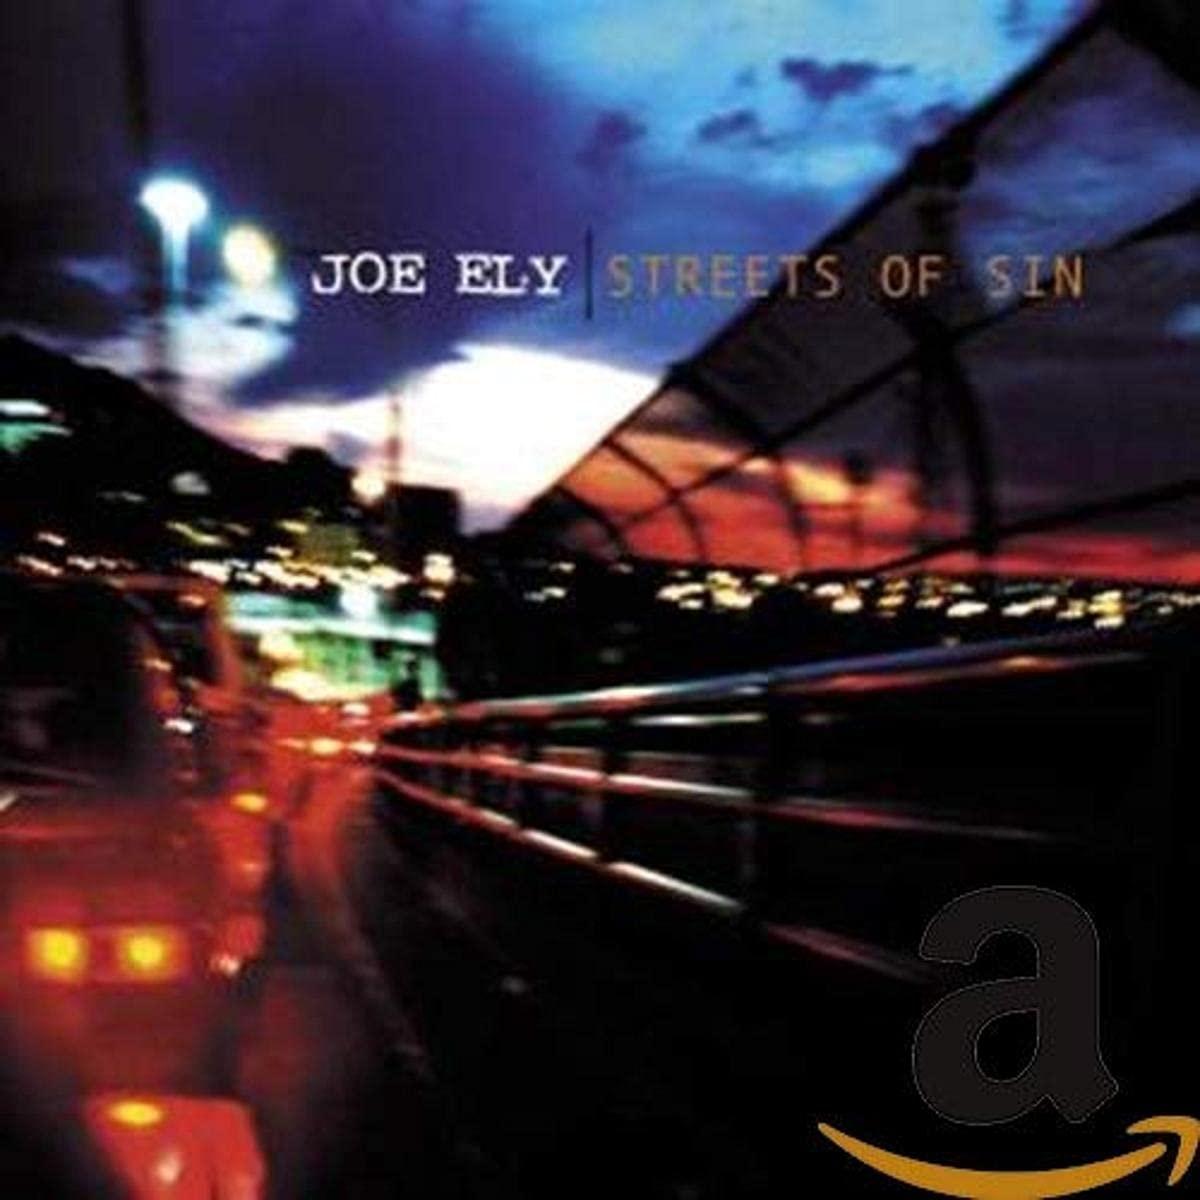 Joe Ely - Streets Of Sin (2003) [FLAC] Download